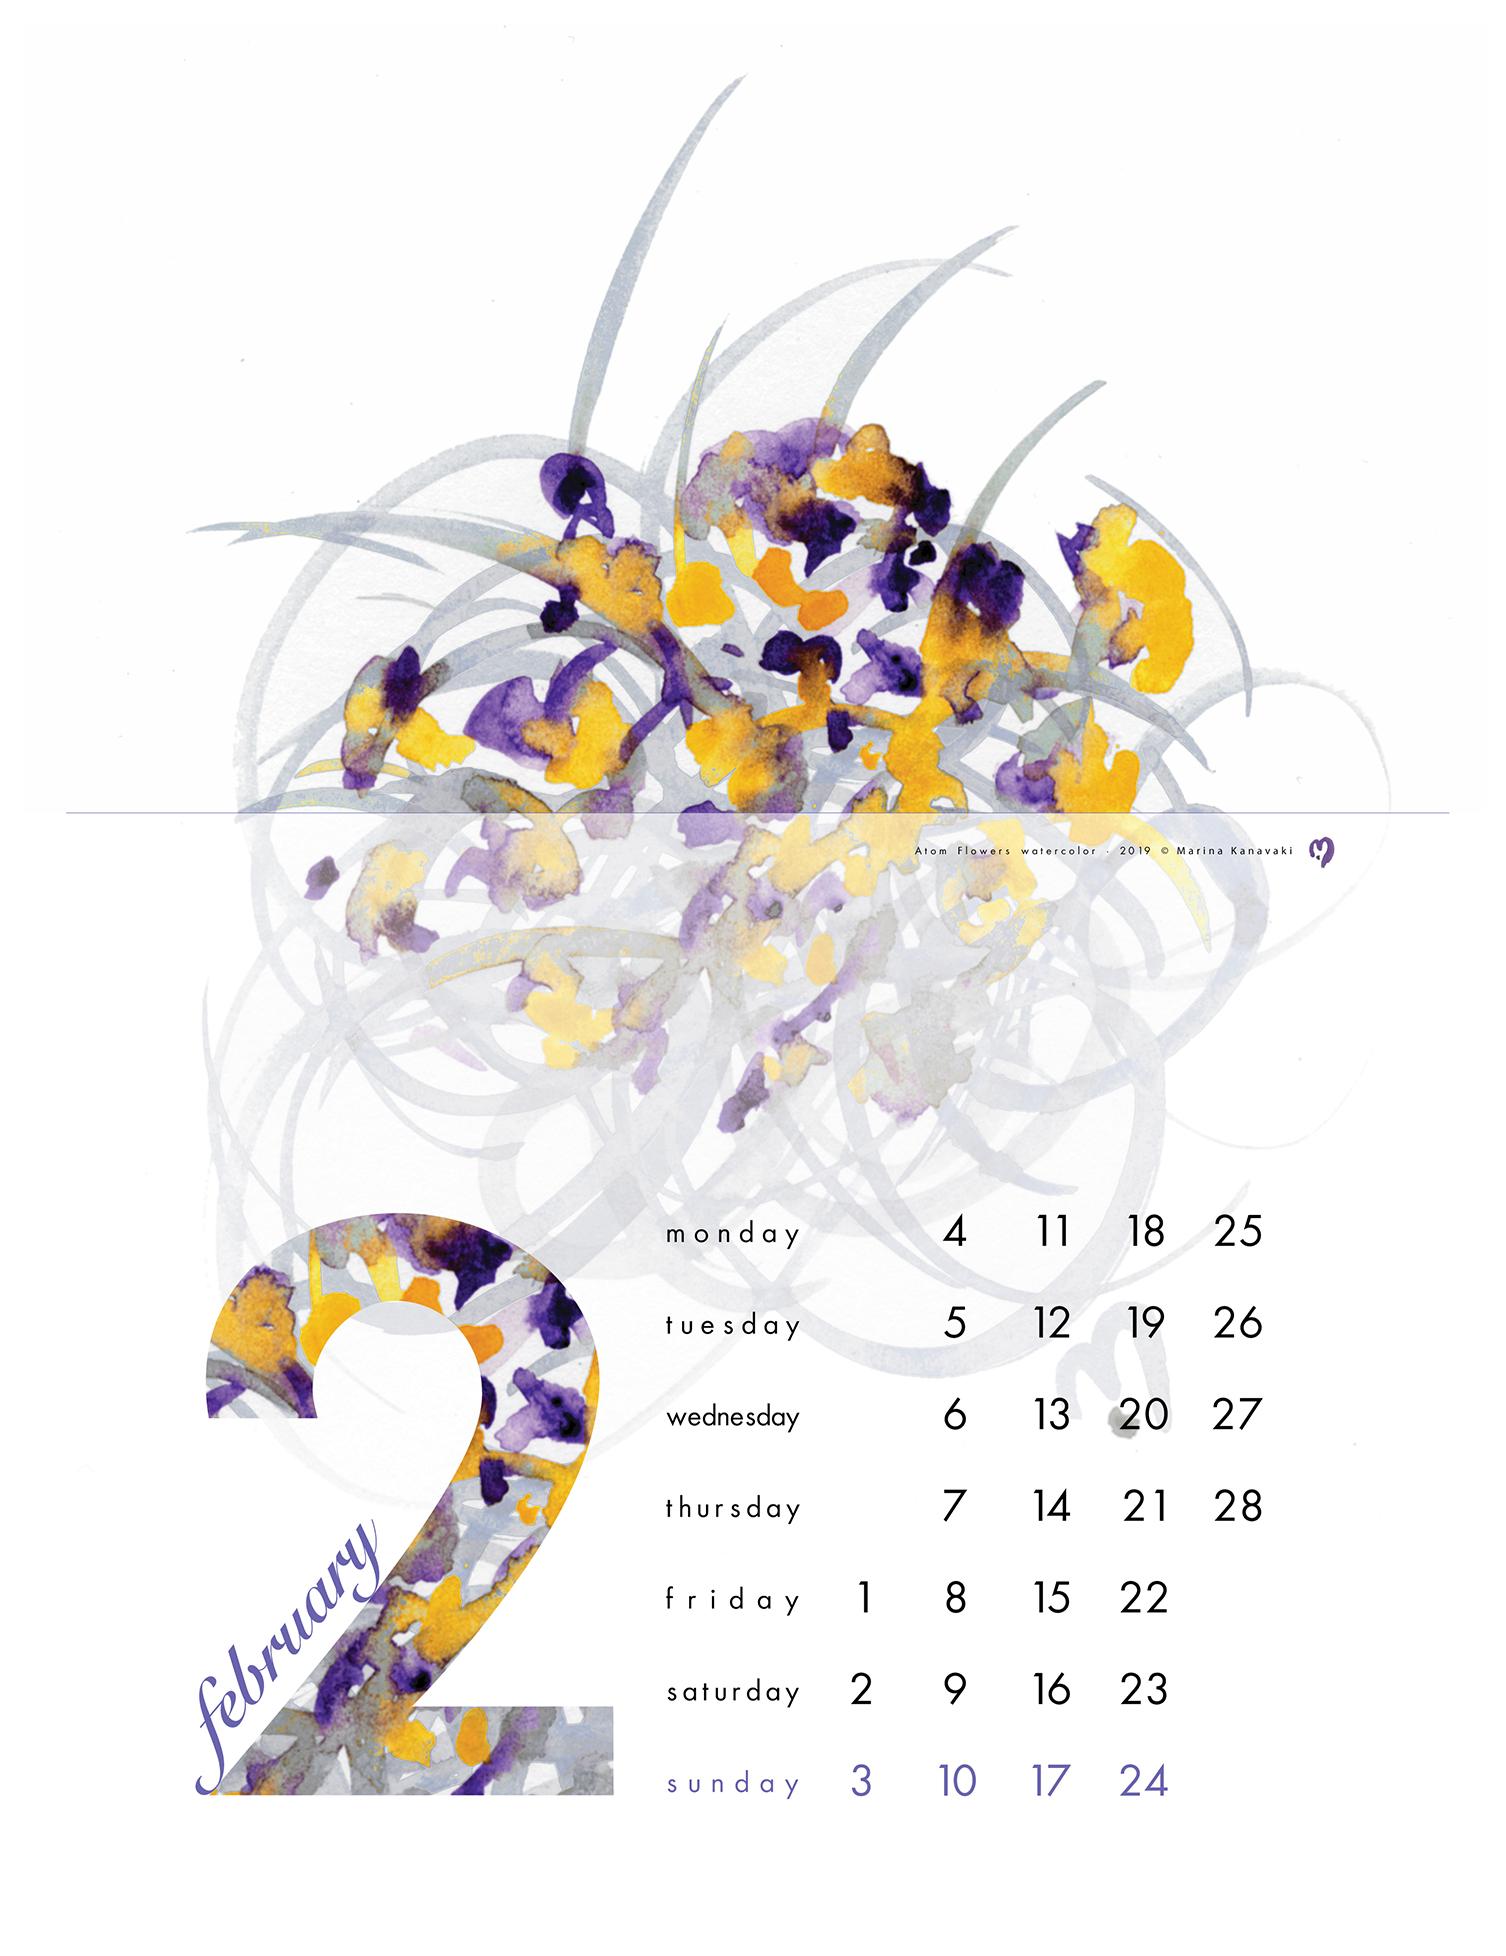 February 2019 - calendar - original artwork and watercolor painting by Marina Kanavaki